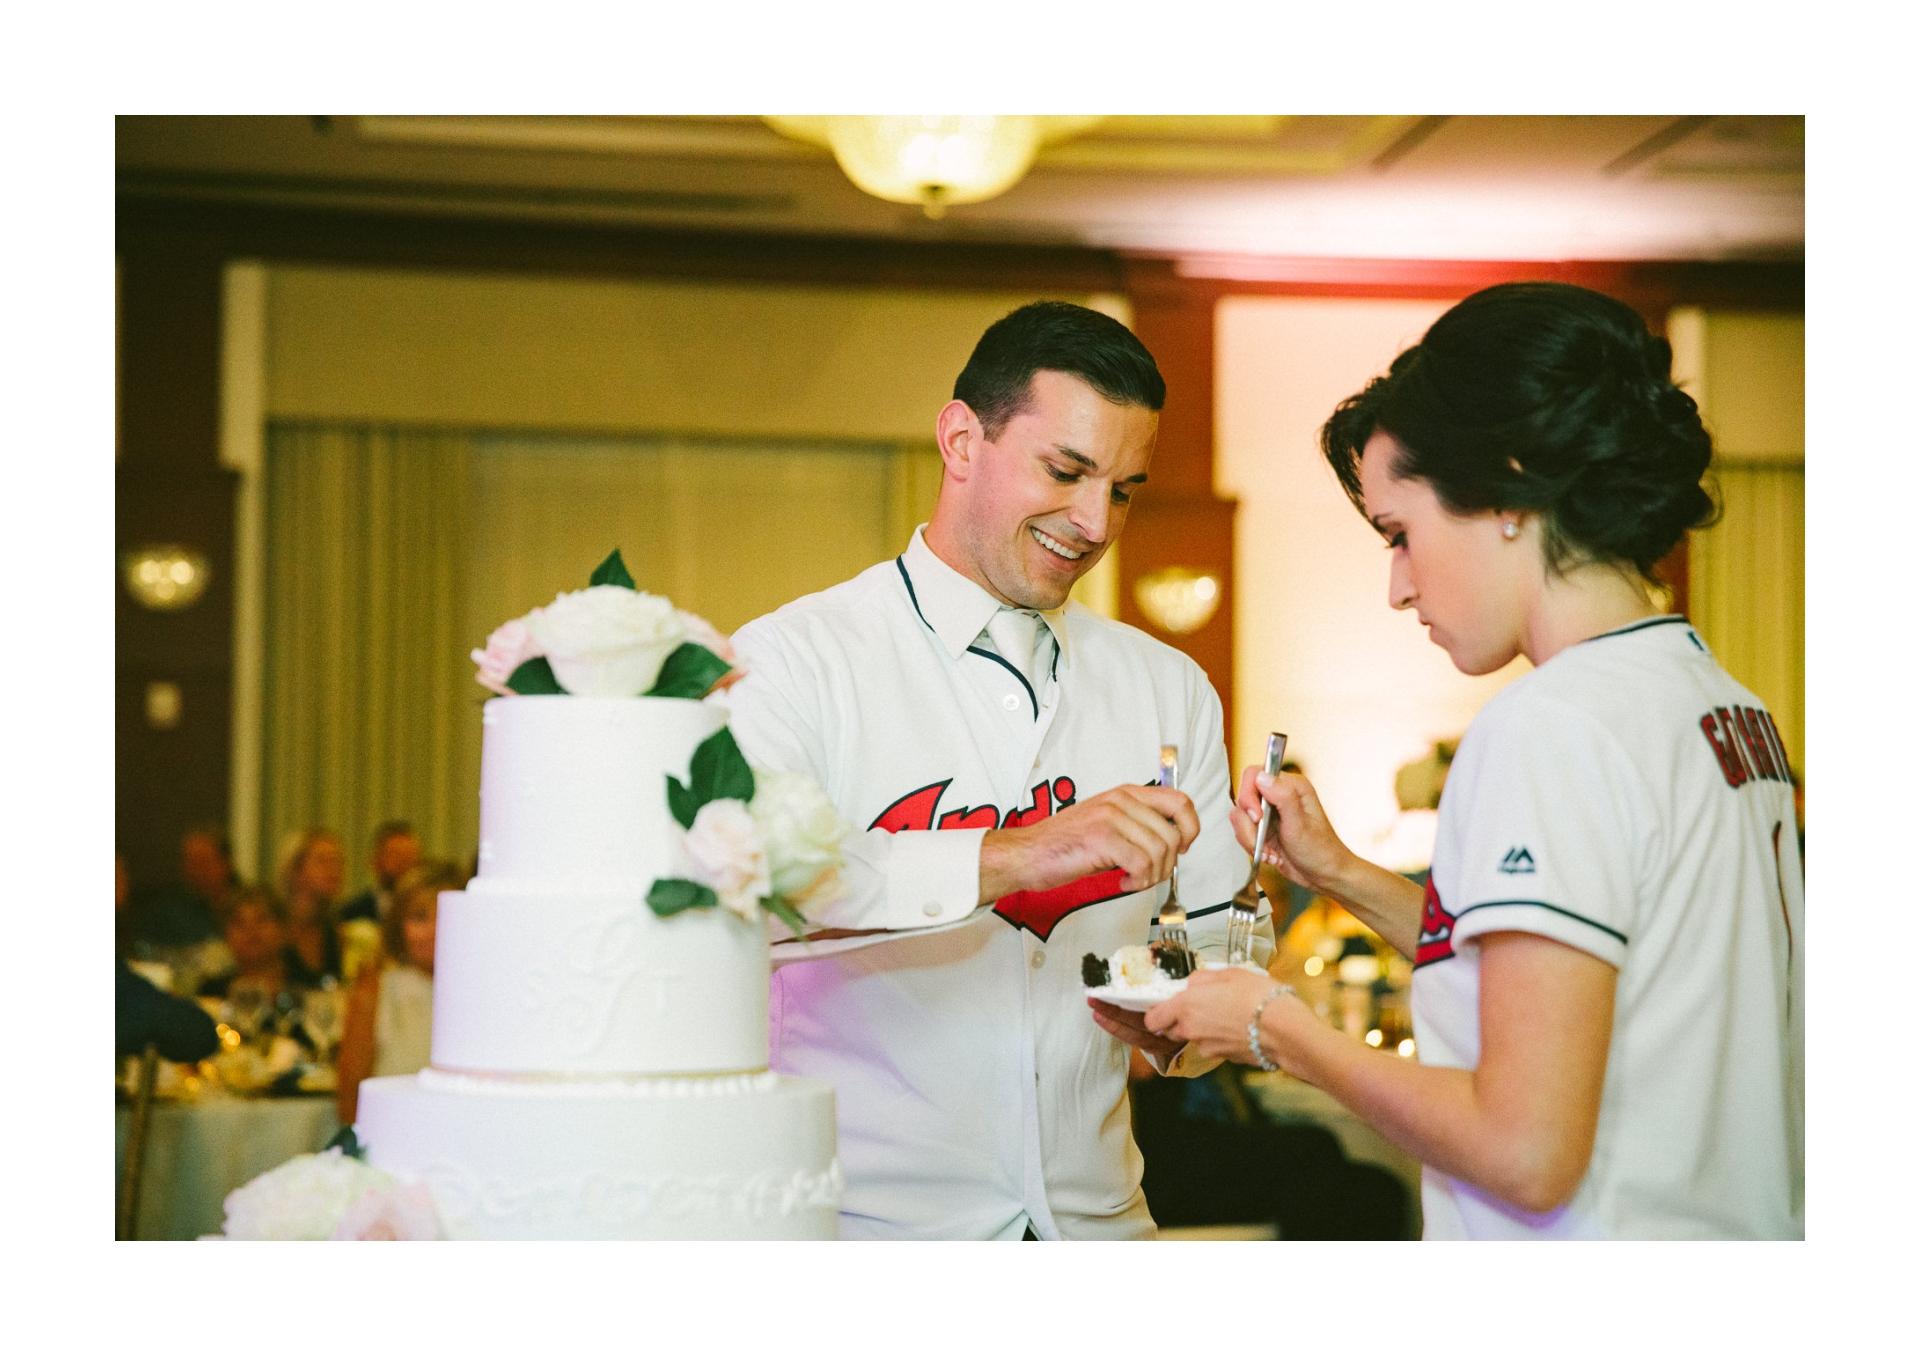 Intercontinental Hotel Wedding in Cleveland 2 32.jpg